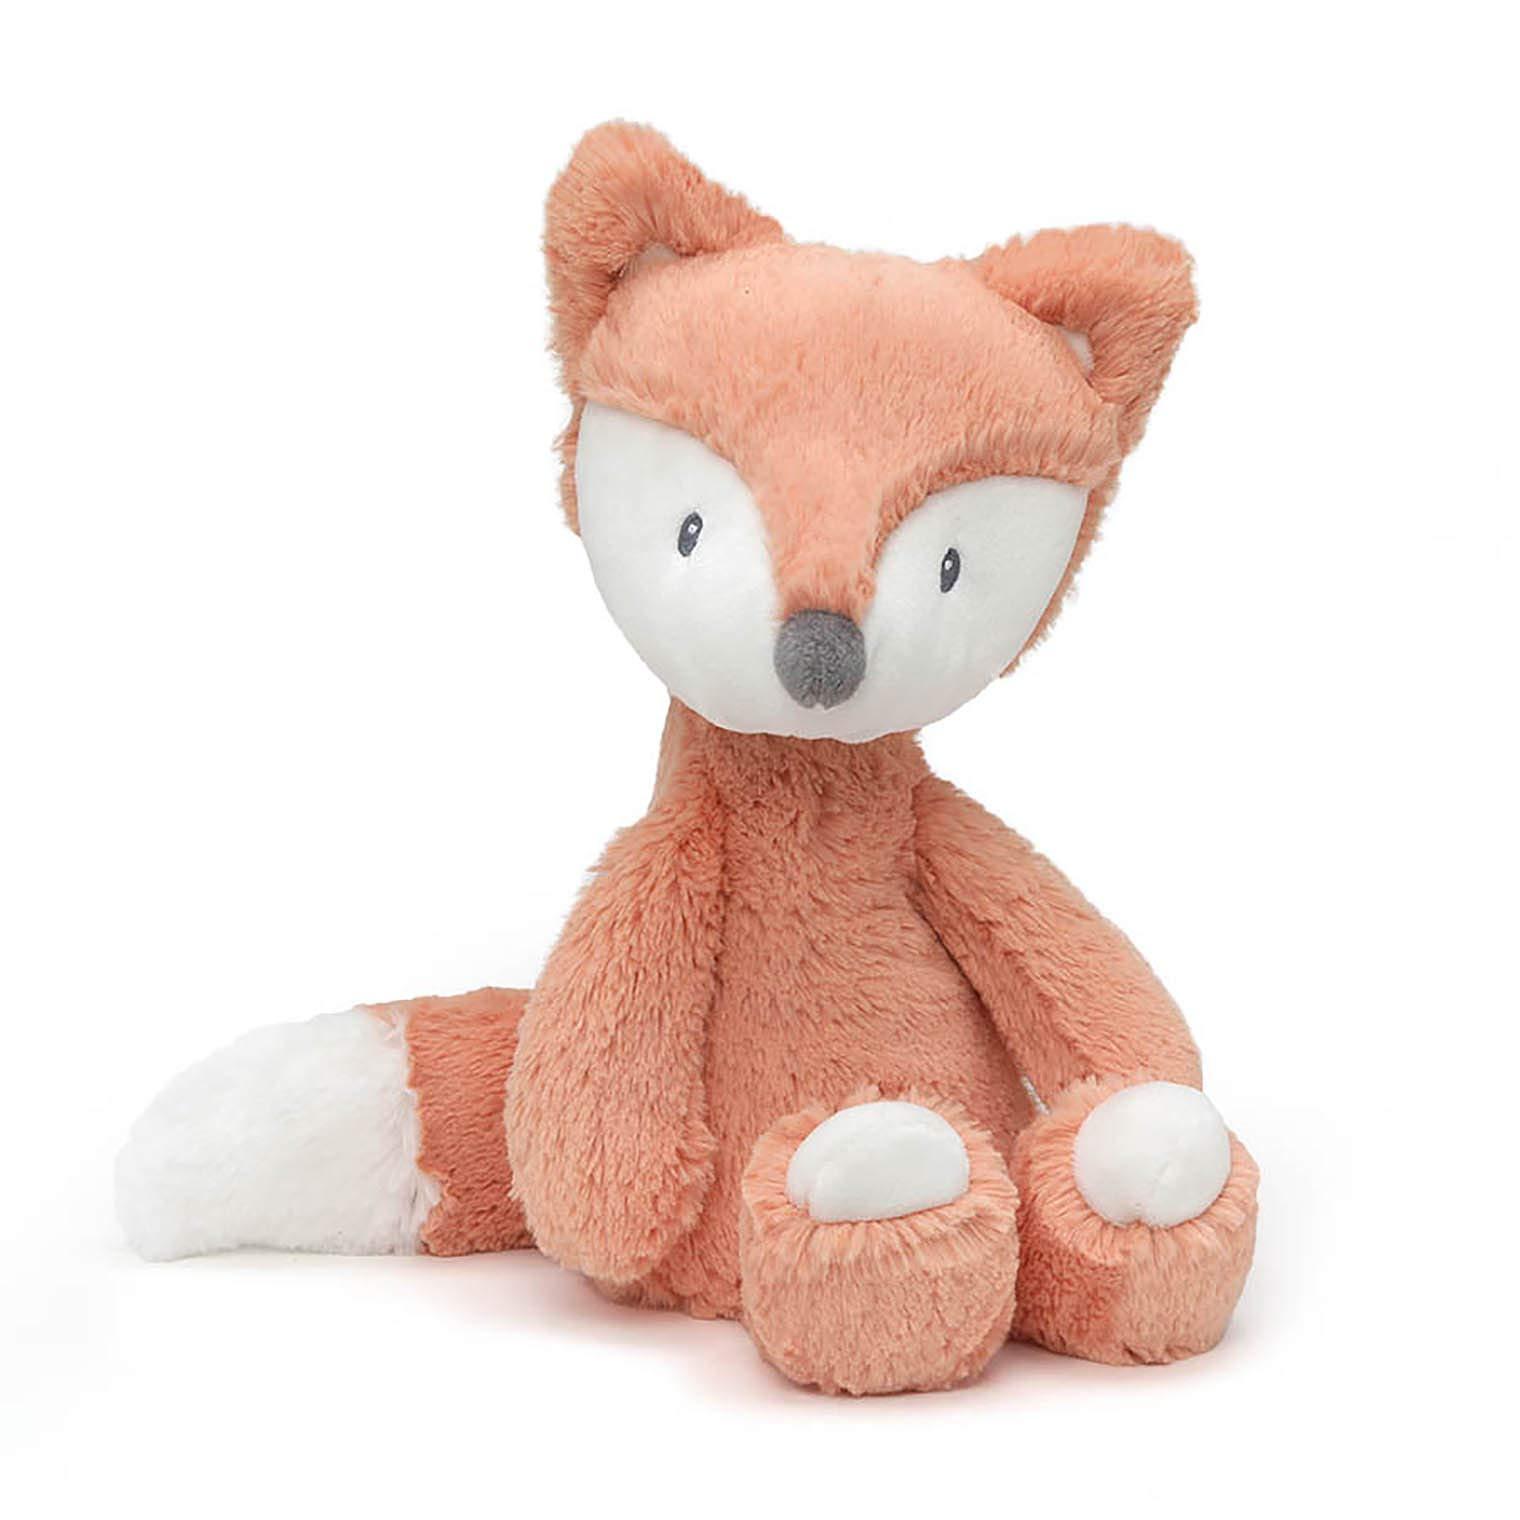 GUND Baby Baby Toothpick Plush Stuffed Fox, 12'', Multicolor by GUND